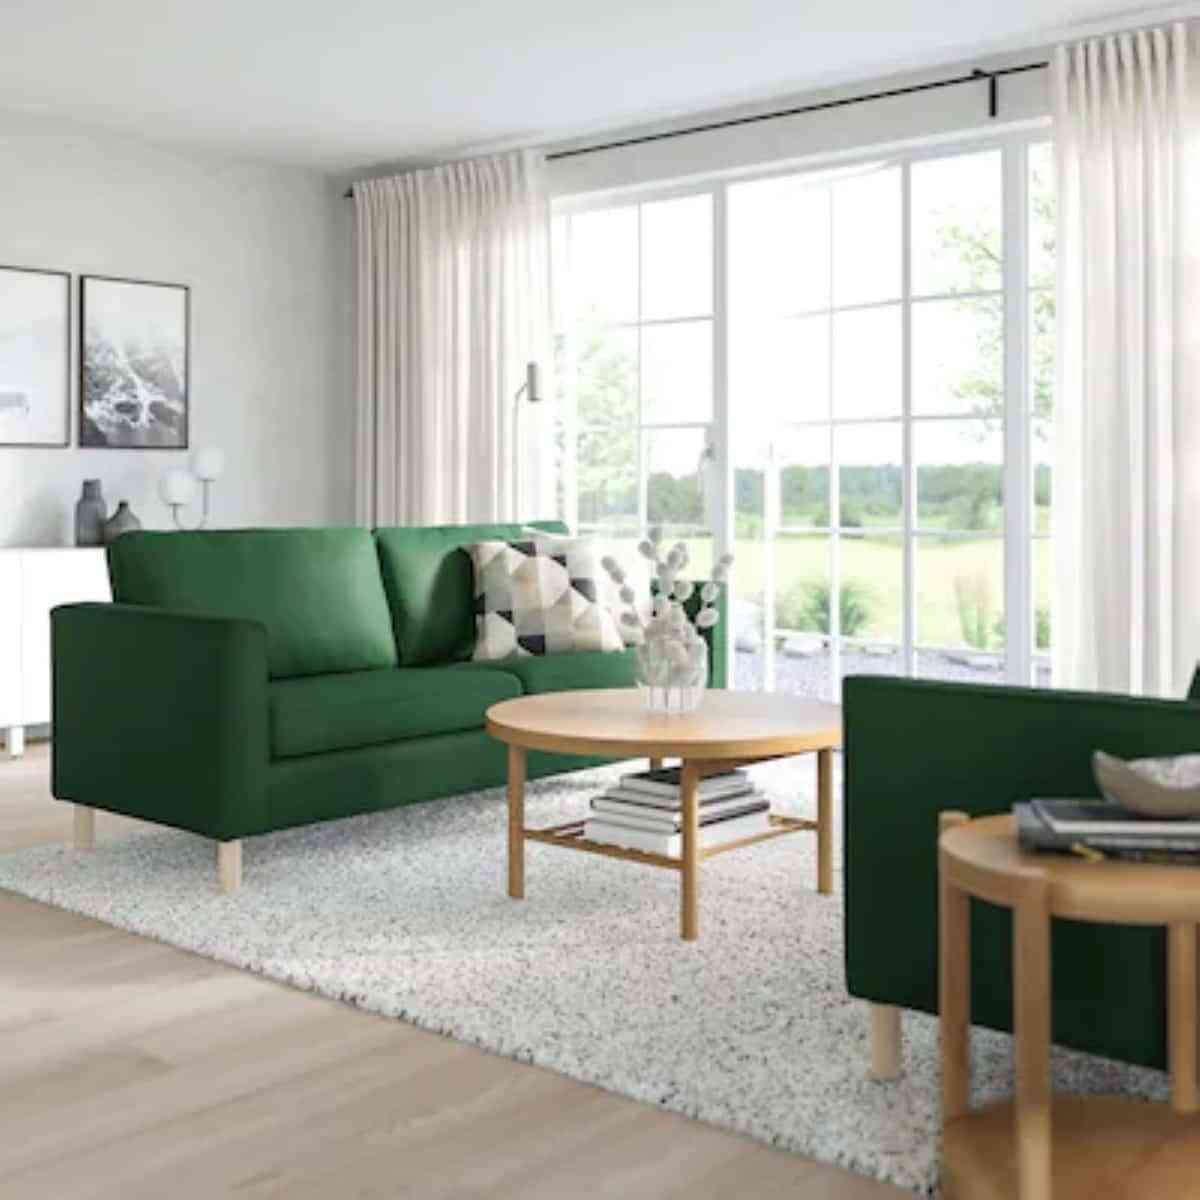 sofa verde de ikea